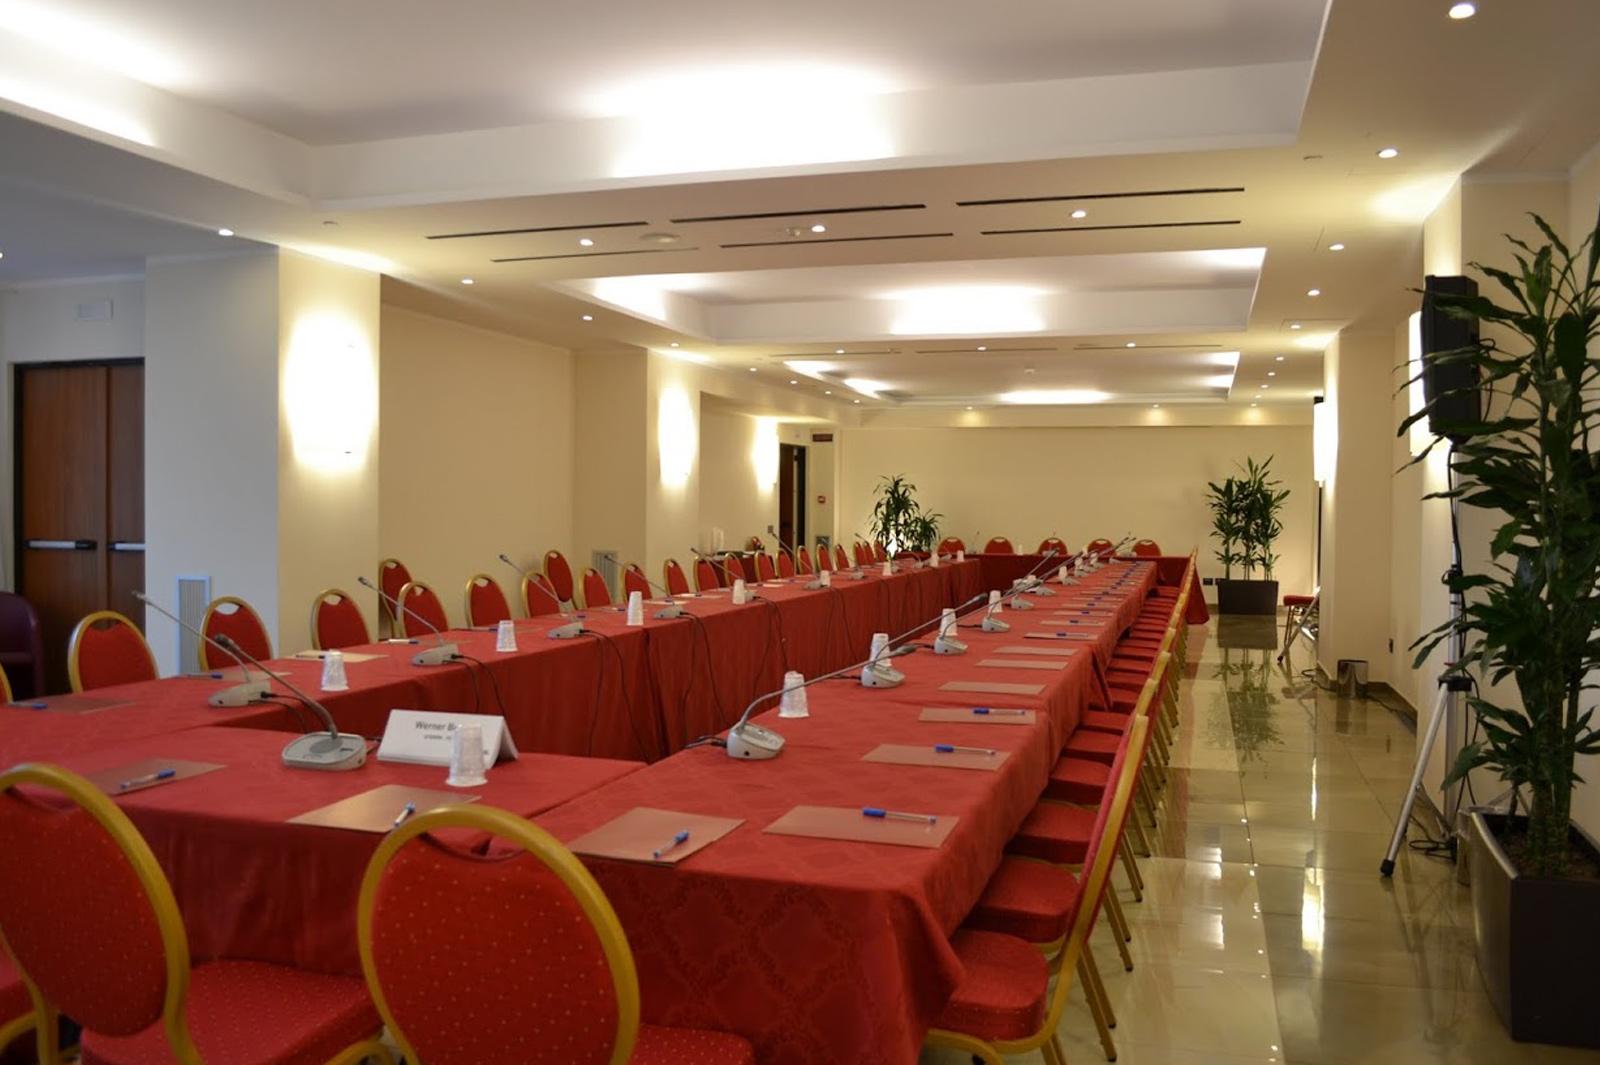 Hotel cardinal st peter roma centro congressi cardinal for Hotel roma centro